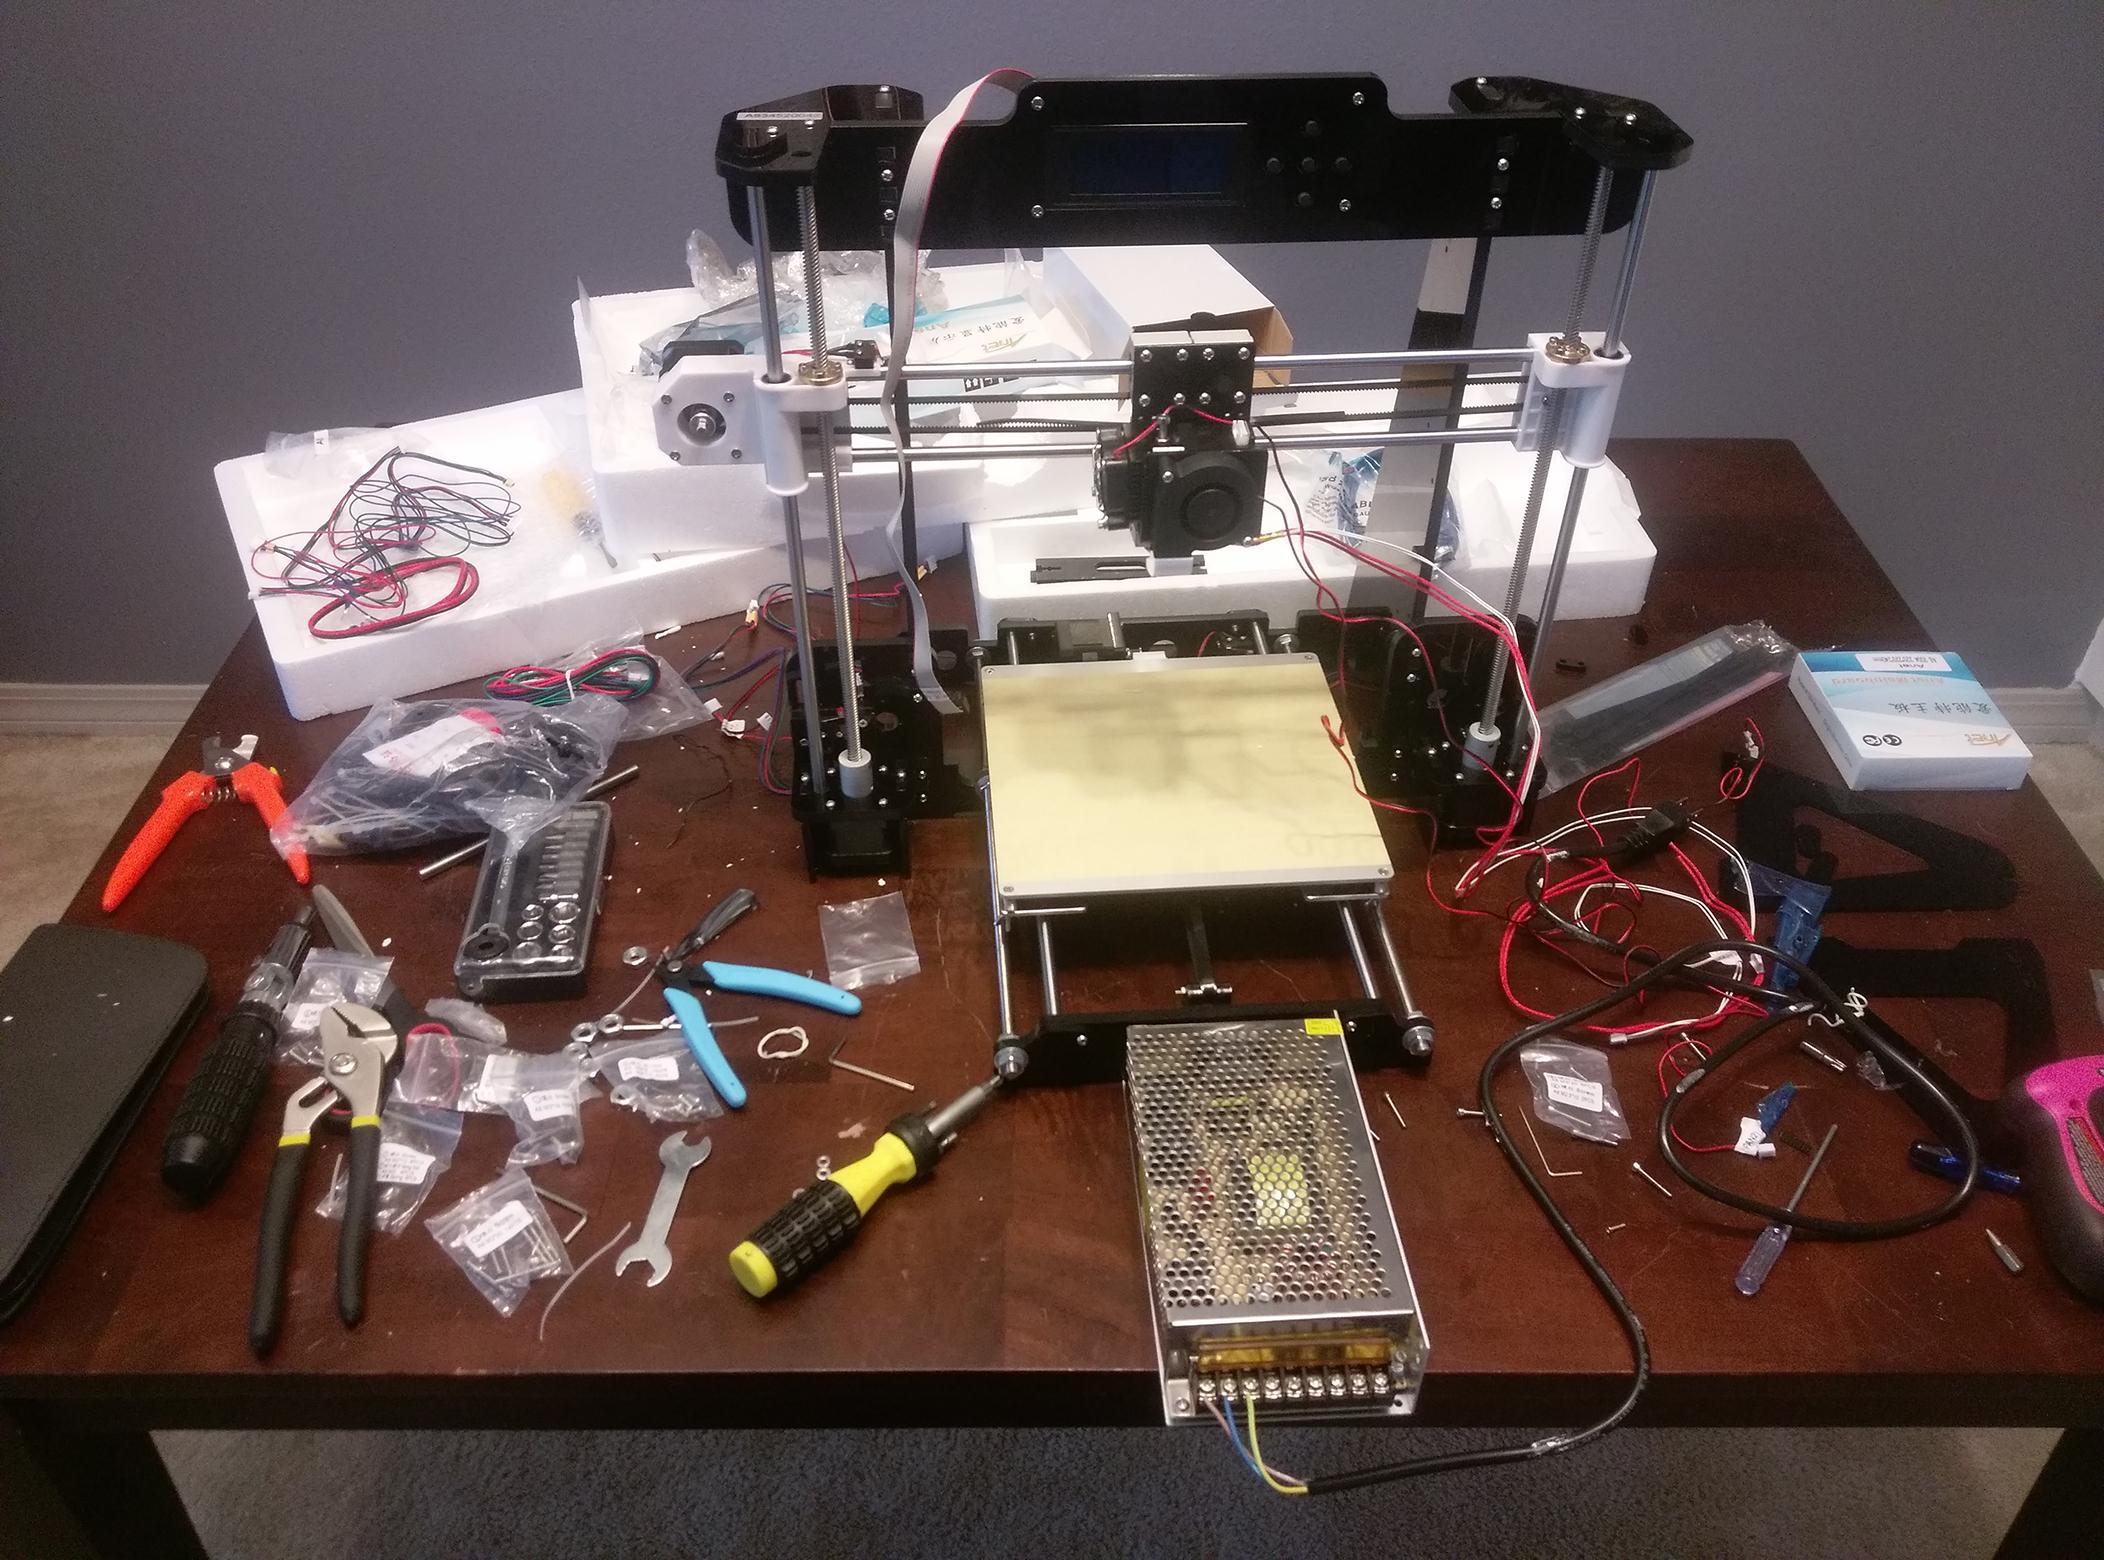 Review: The Anet A8 3D Printer - Let's Print 3D